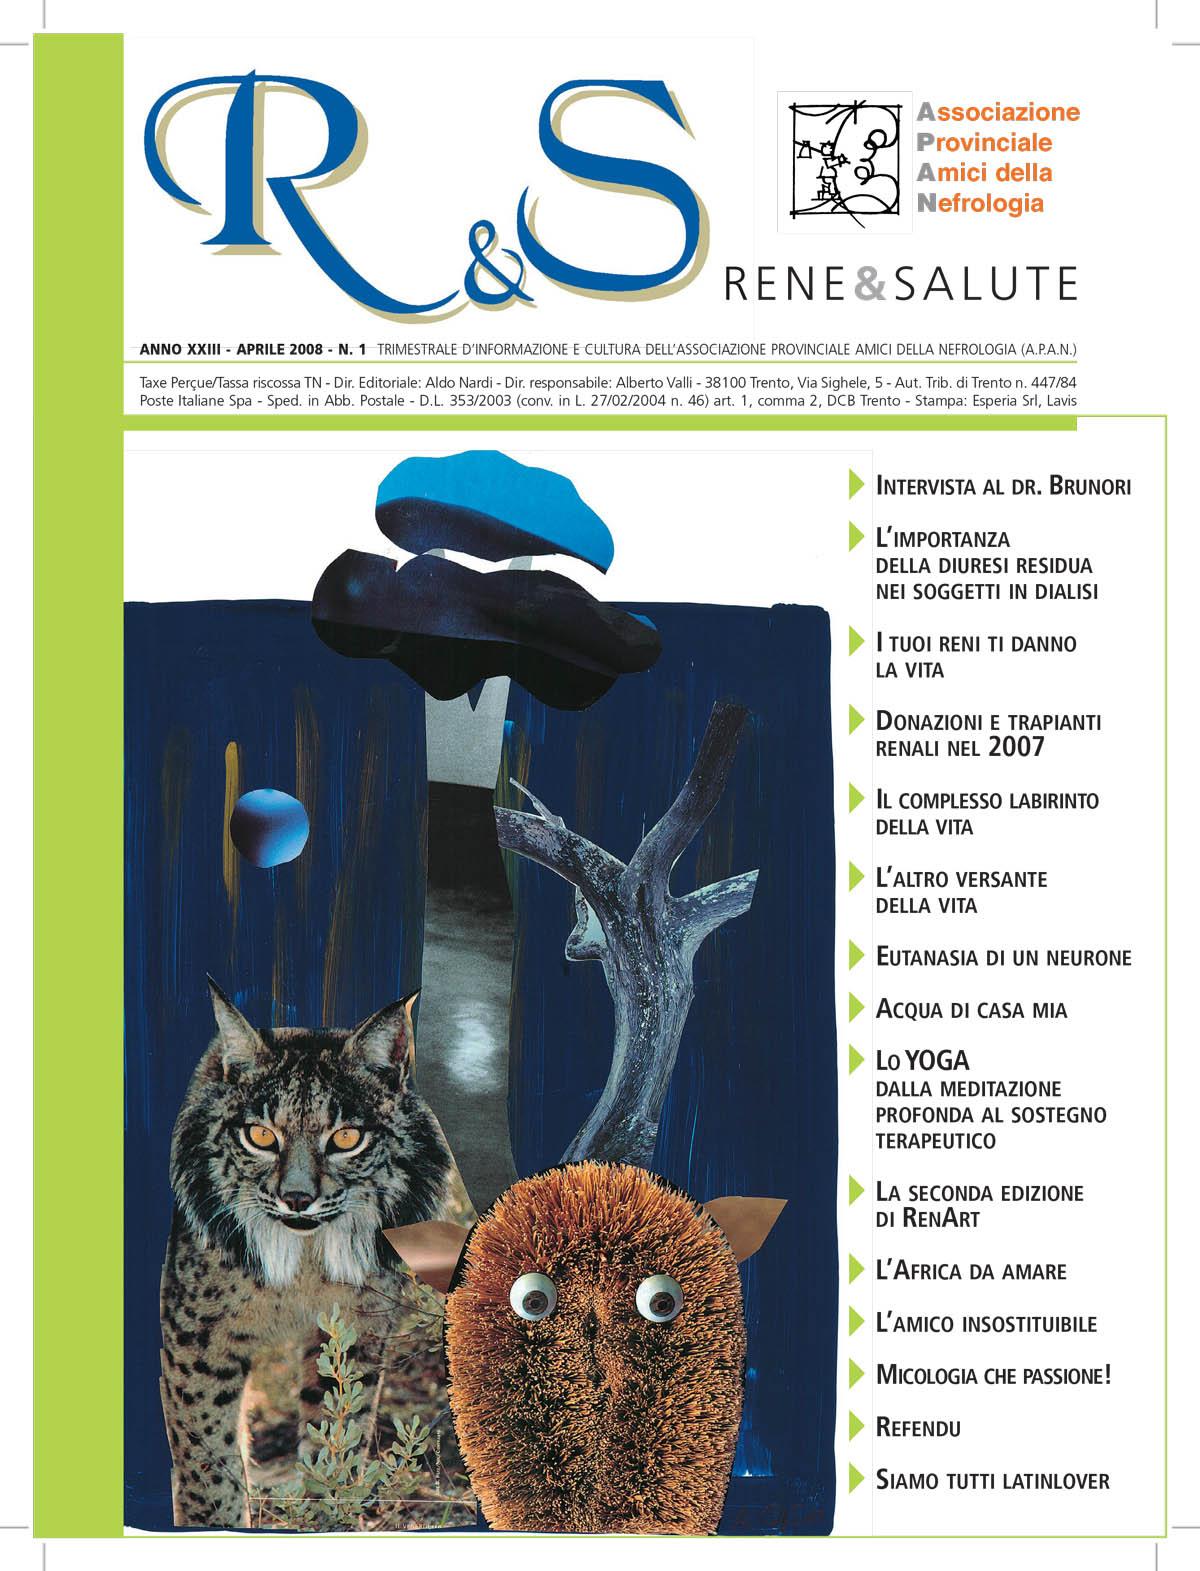 Rene & Salute 2008.1